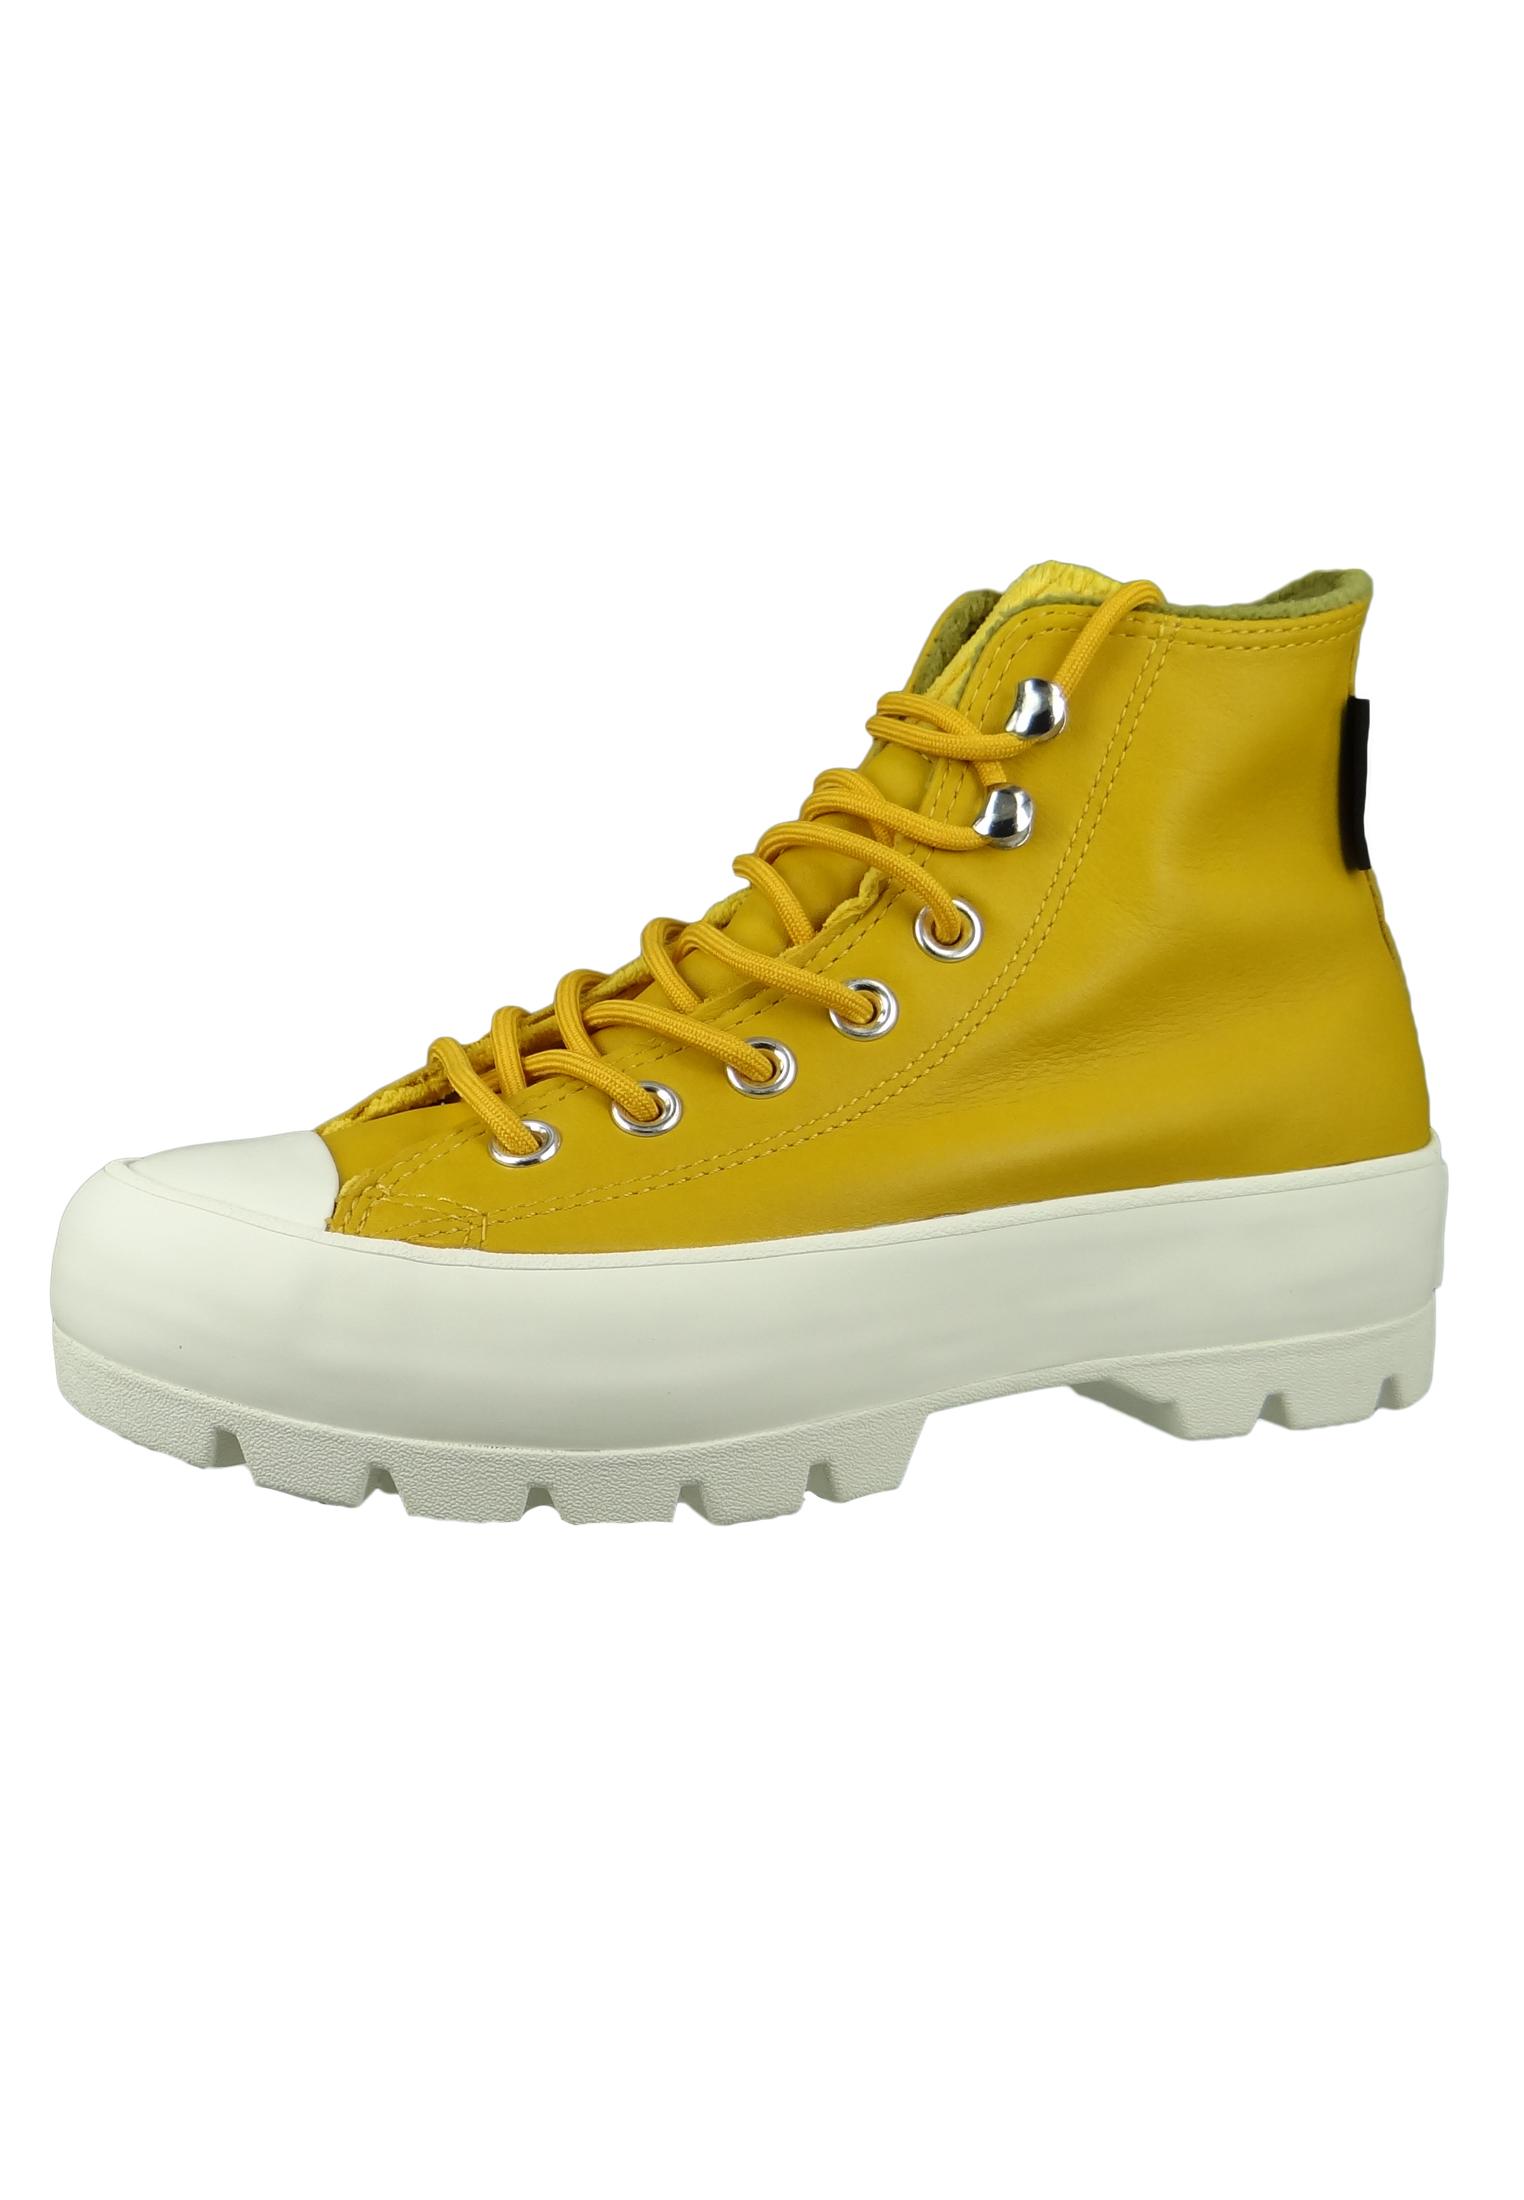 Converse Chucks Gelb 565005C Chuck Taylor All Star Lugged Winter Retrogade  HI - Gold Dart Olive Flak Egret